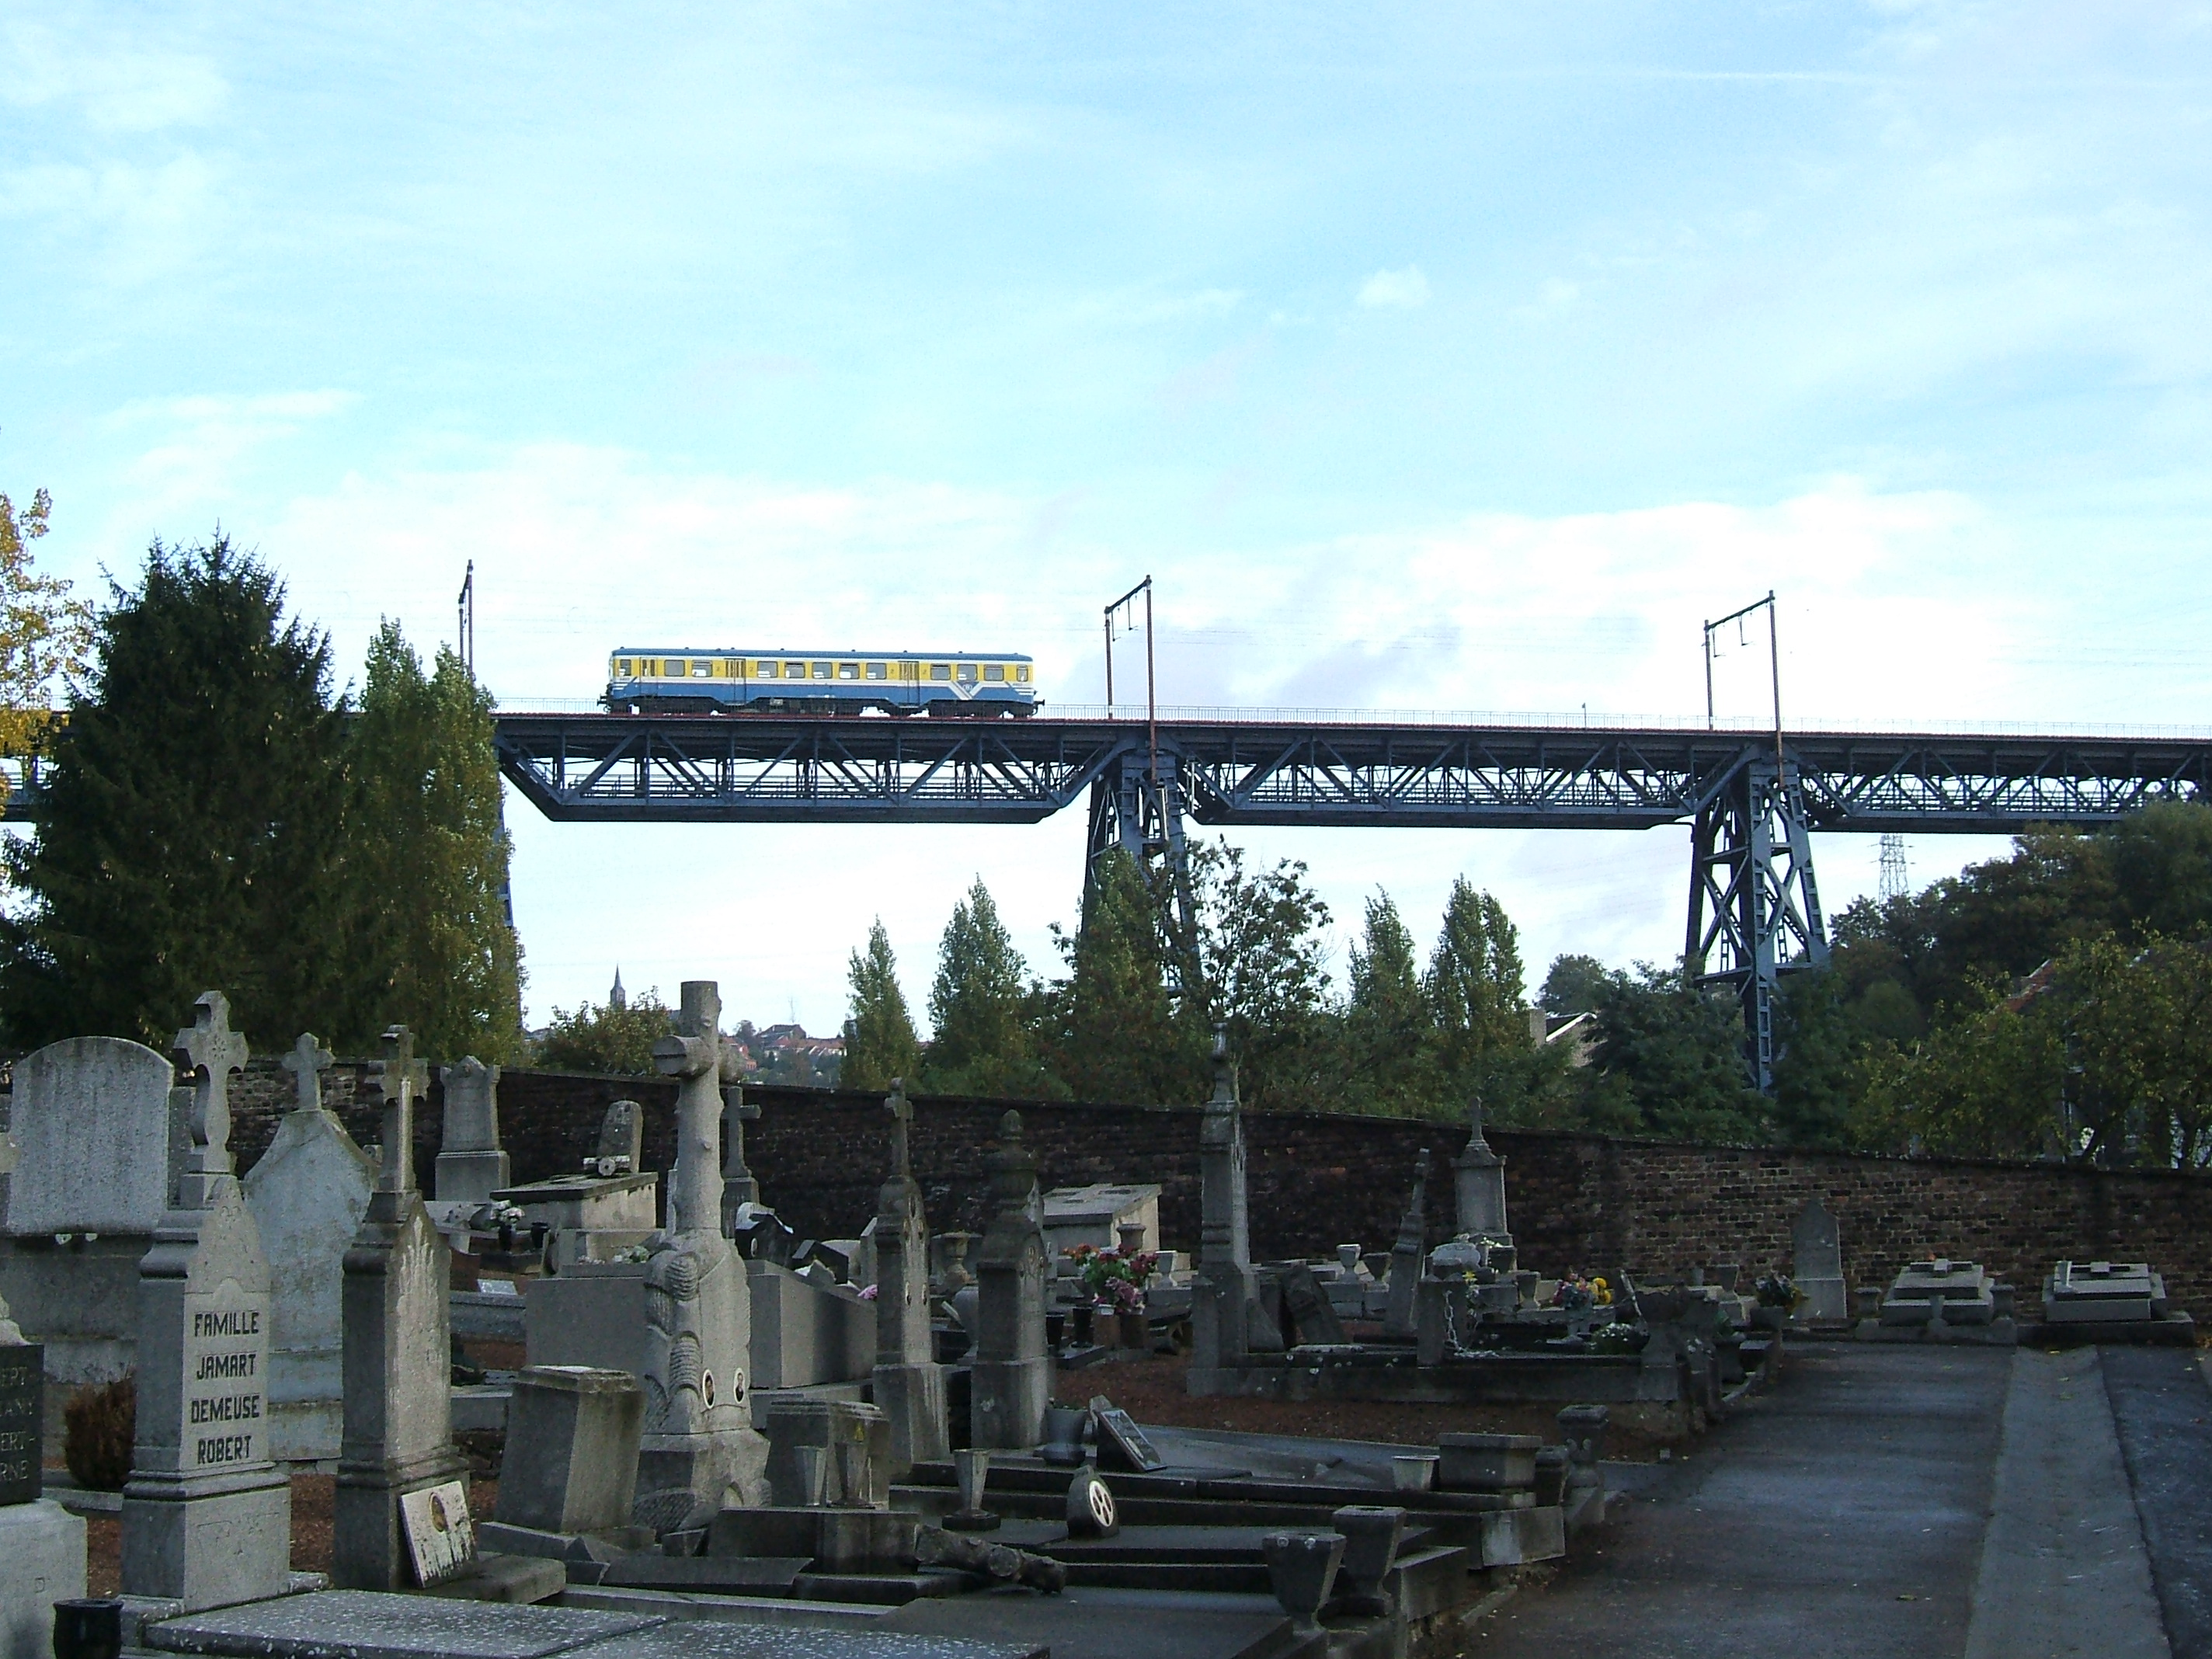 Viaduct van Tilleur